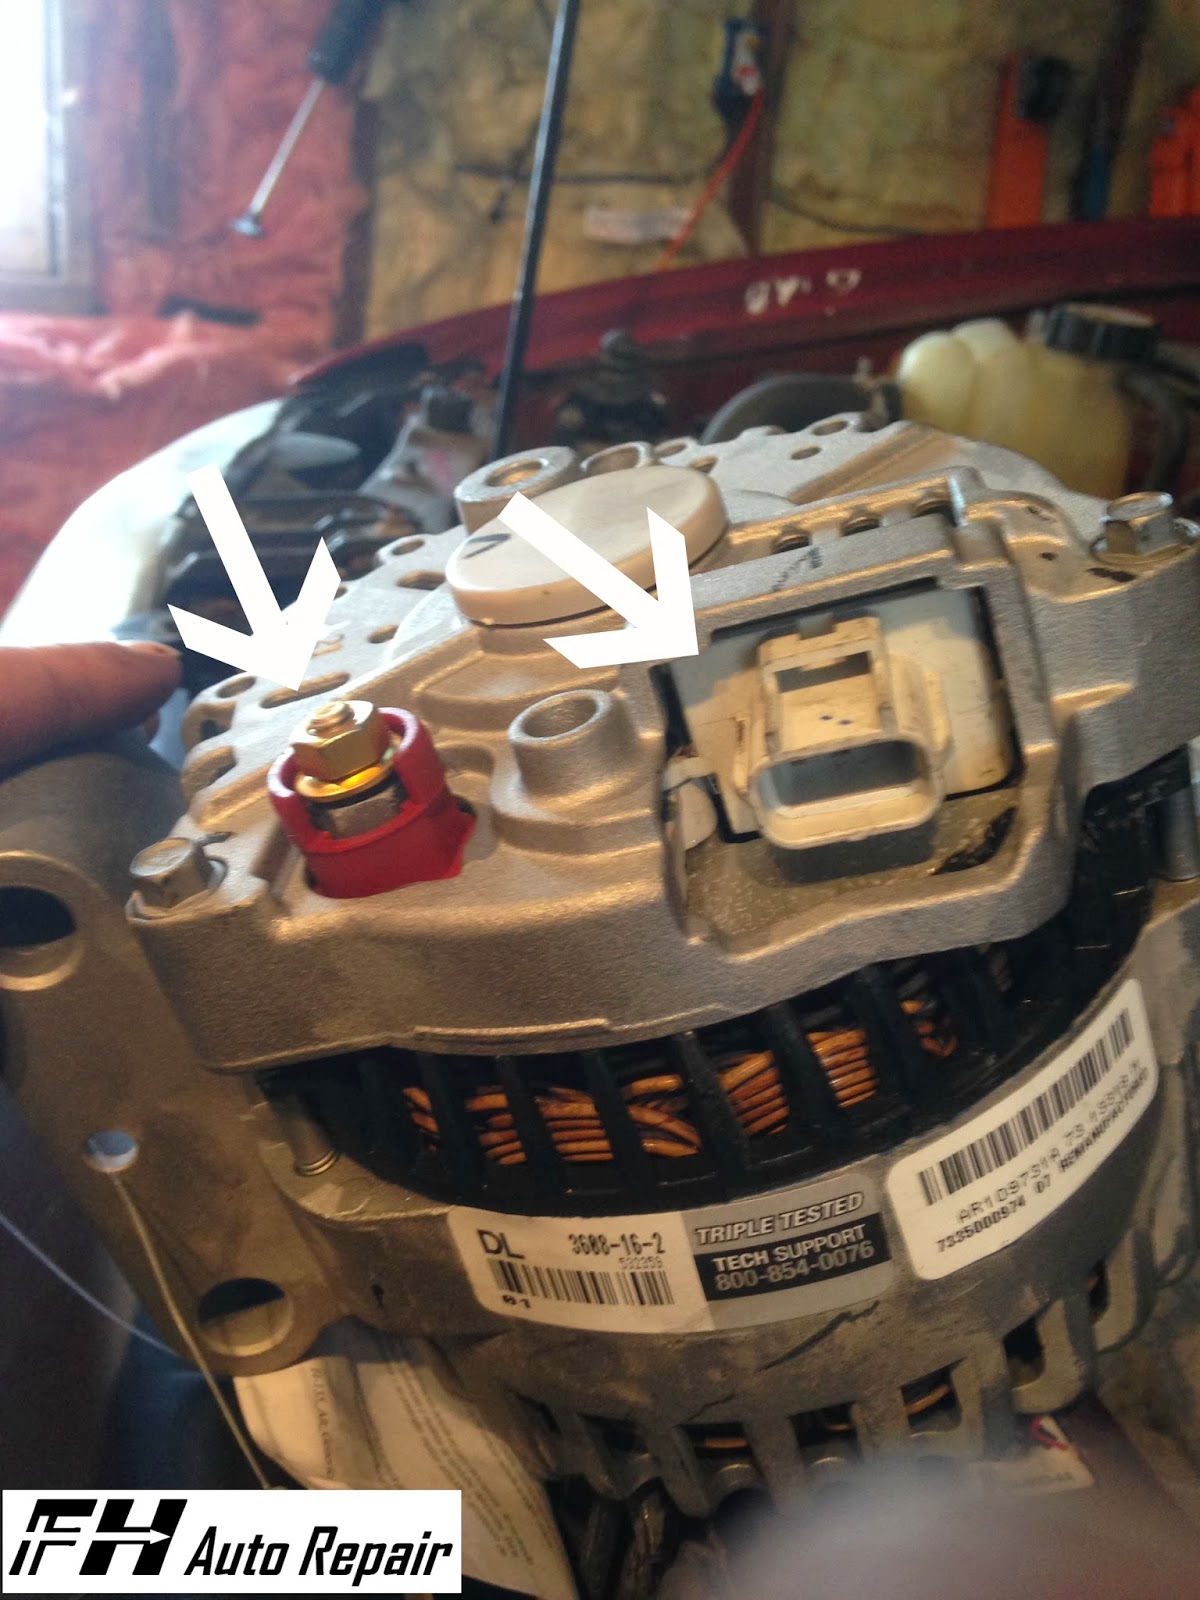 2002 ford escape alternator wiring diagram dicktator 60 2 2001 repair cost